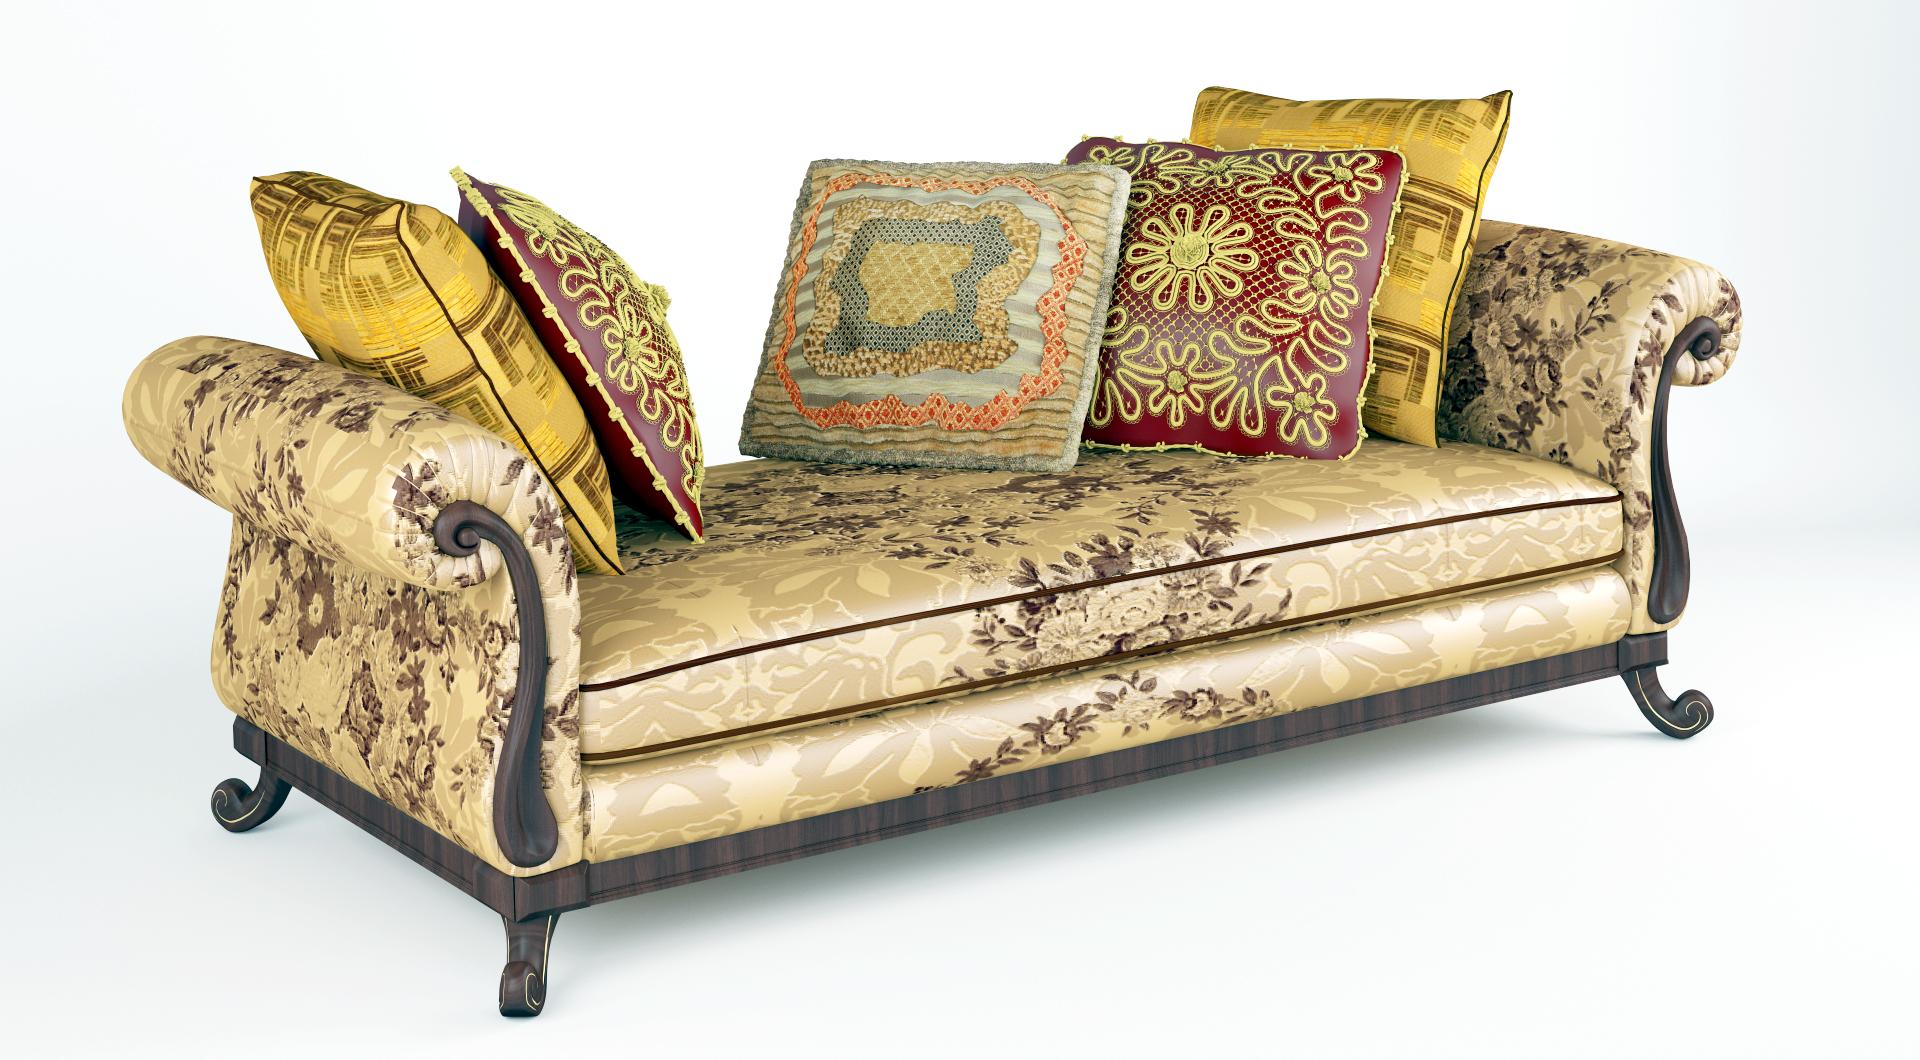 Royal Sofa With Pillows 3d model max fbx ma mb obj 286254